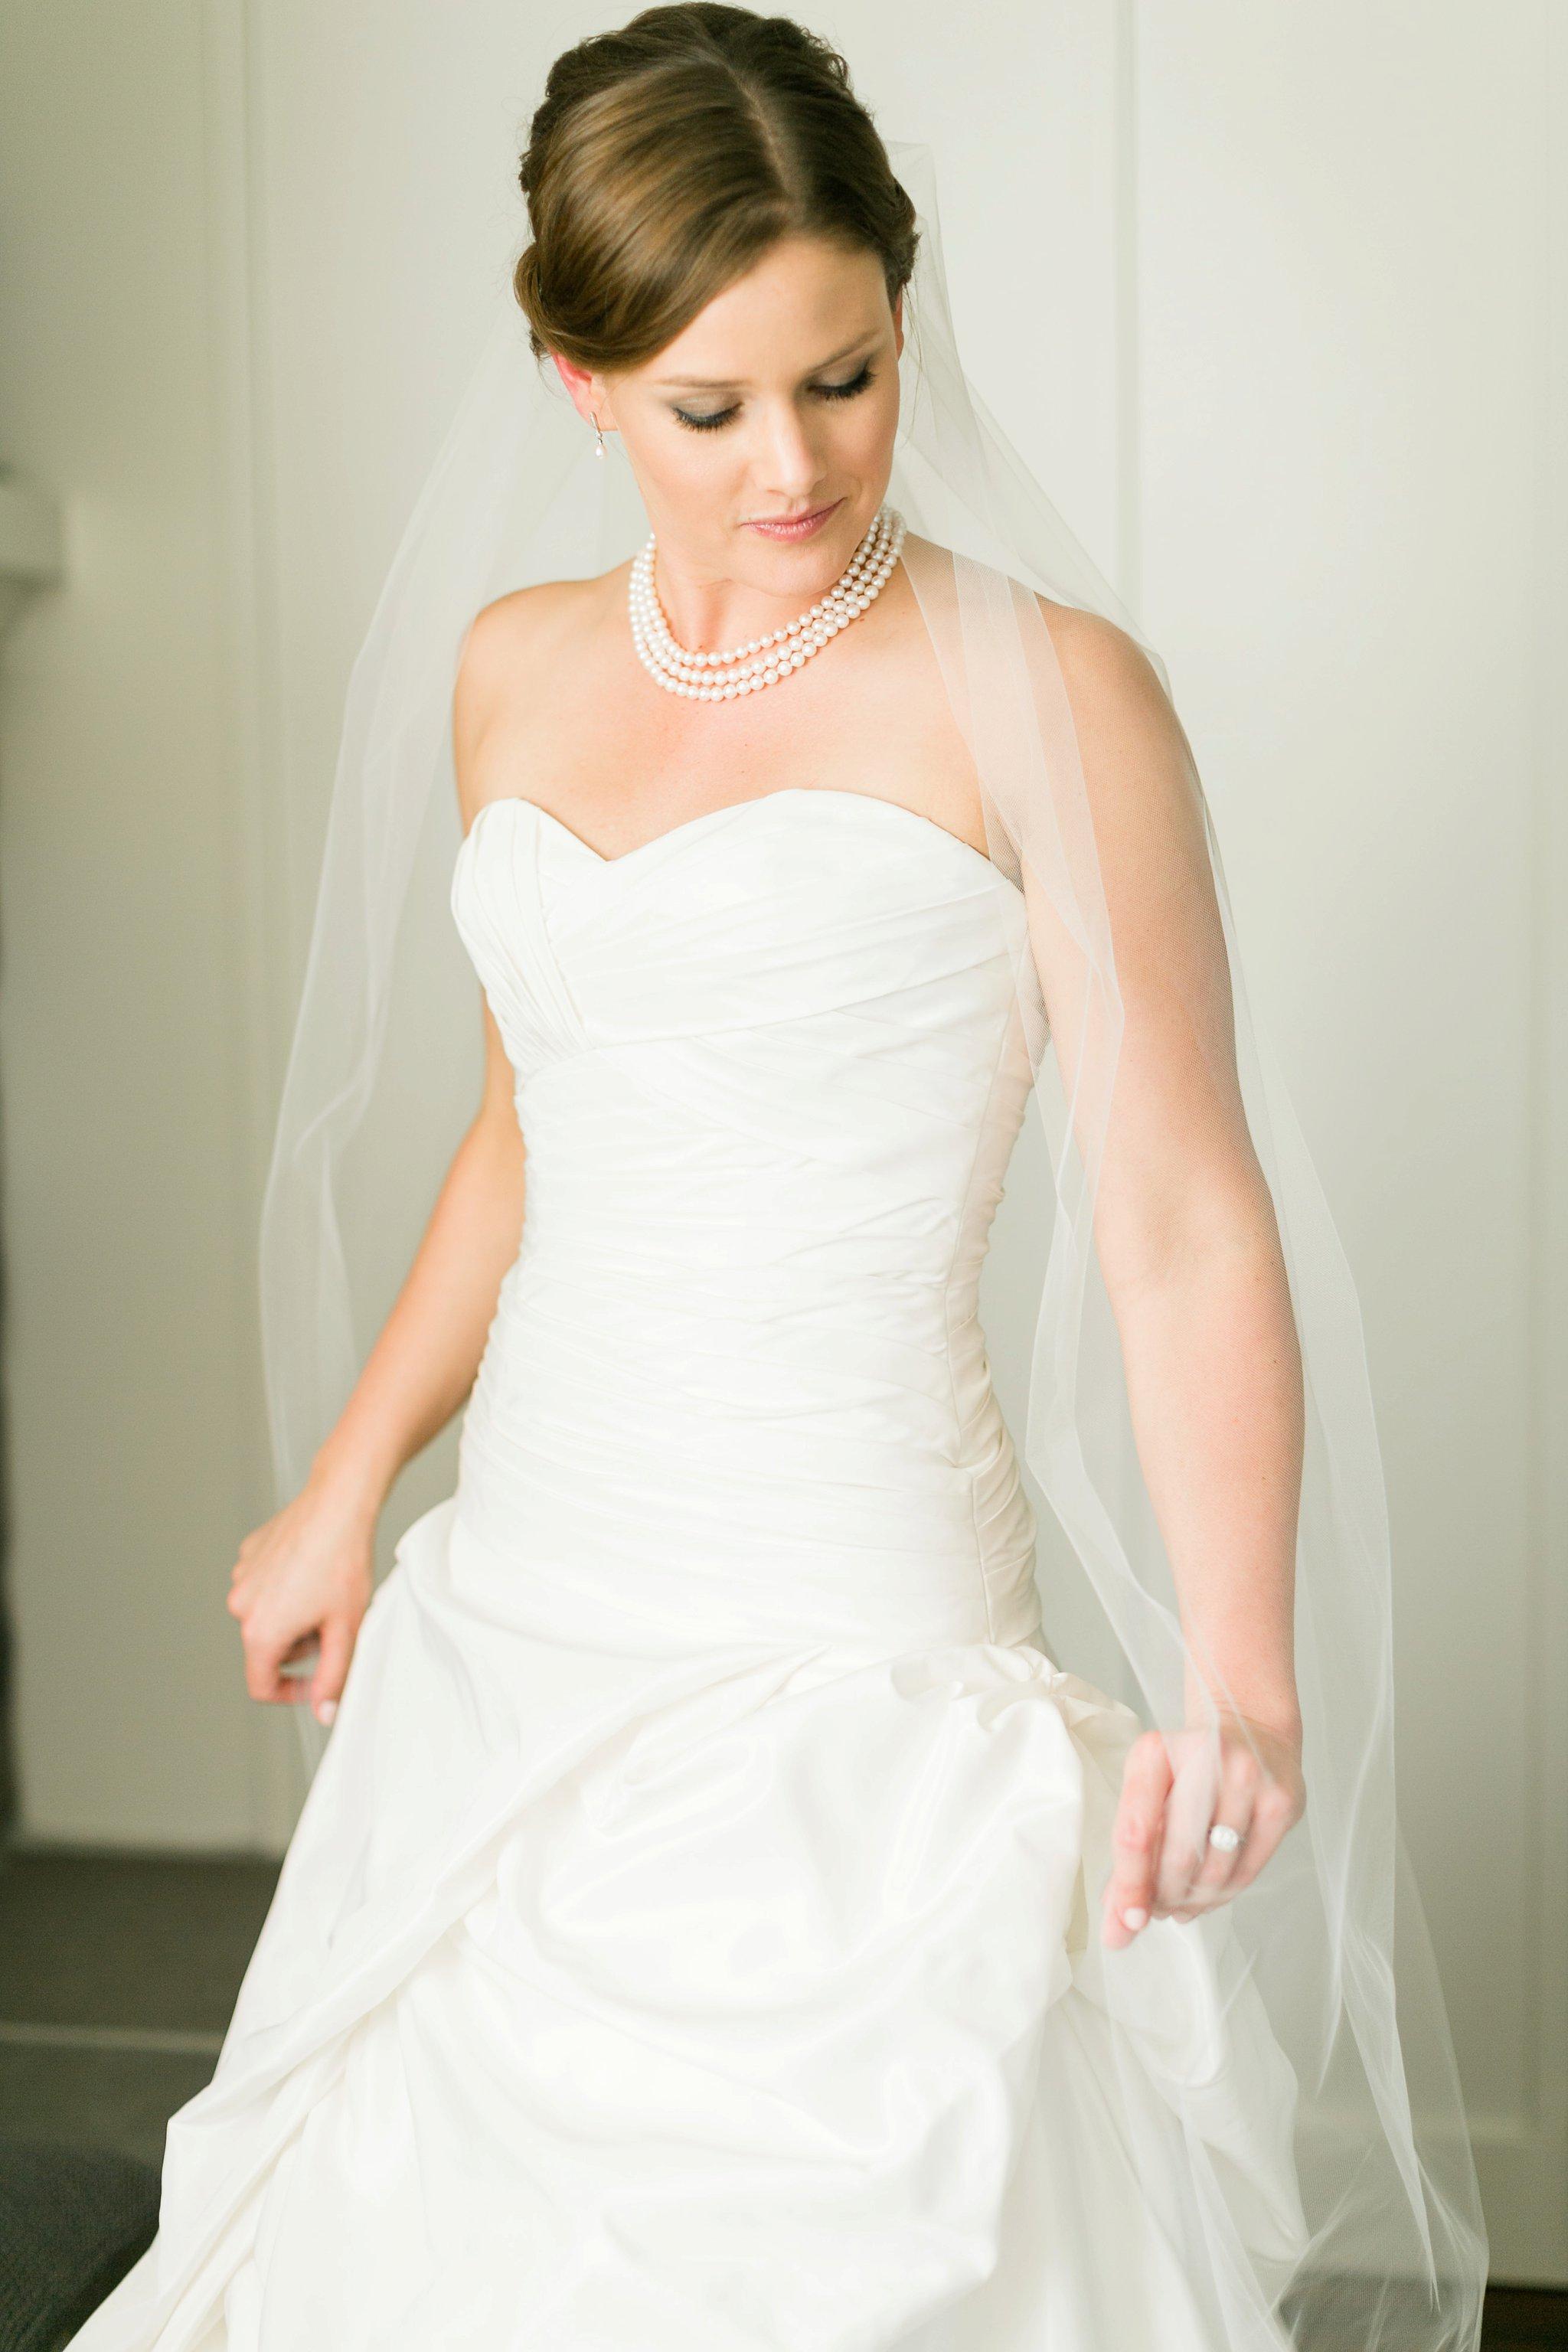 Chelan Washington Wedding Photos Megan Kelsey Photography Delight Wedding Workshop Styled Shoot Annalee & Scot-54.jpg